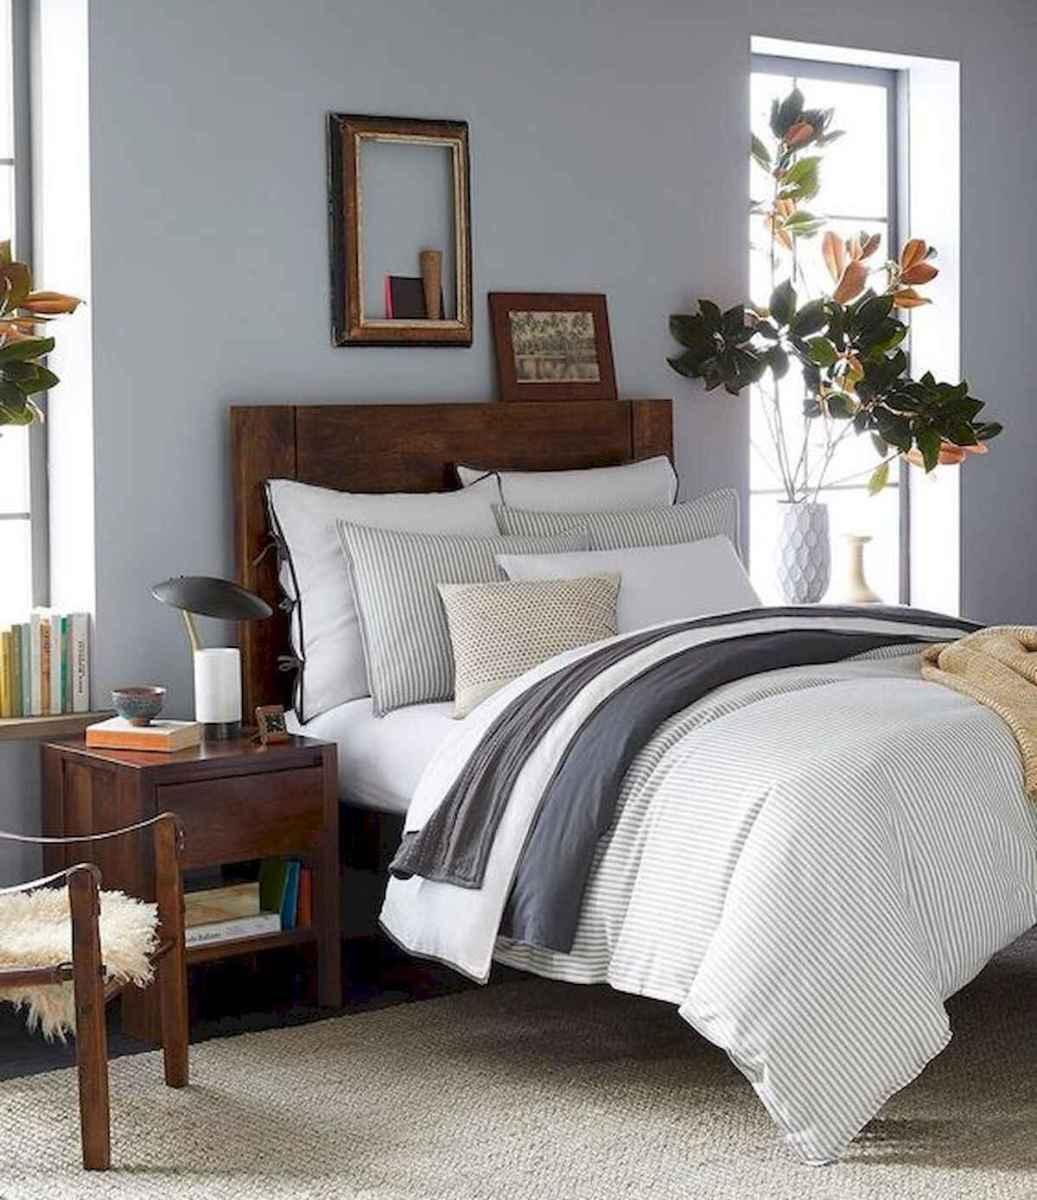 50 Favorite Bedding for Farmhouse Bedroom Design Ideas and Decor (45)